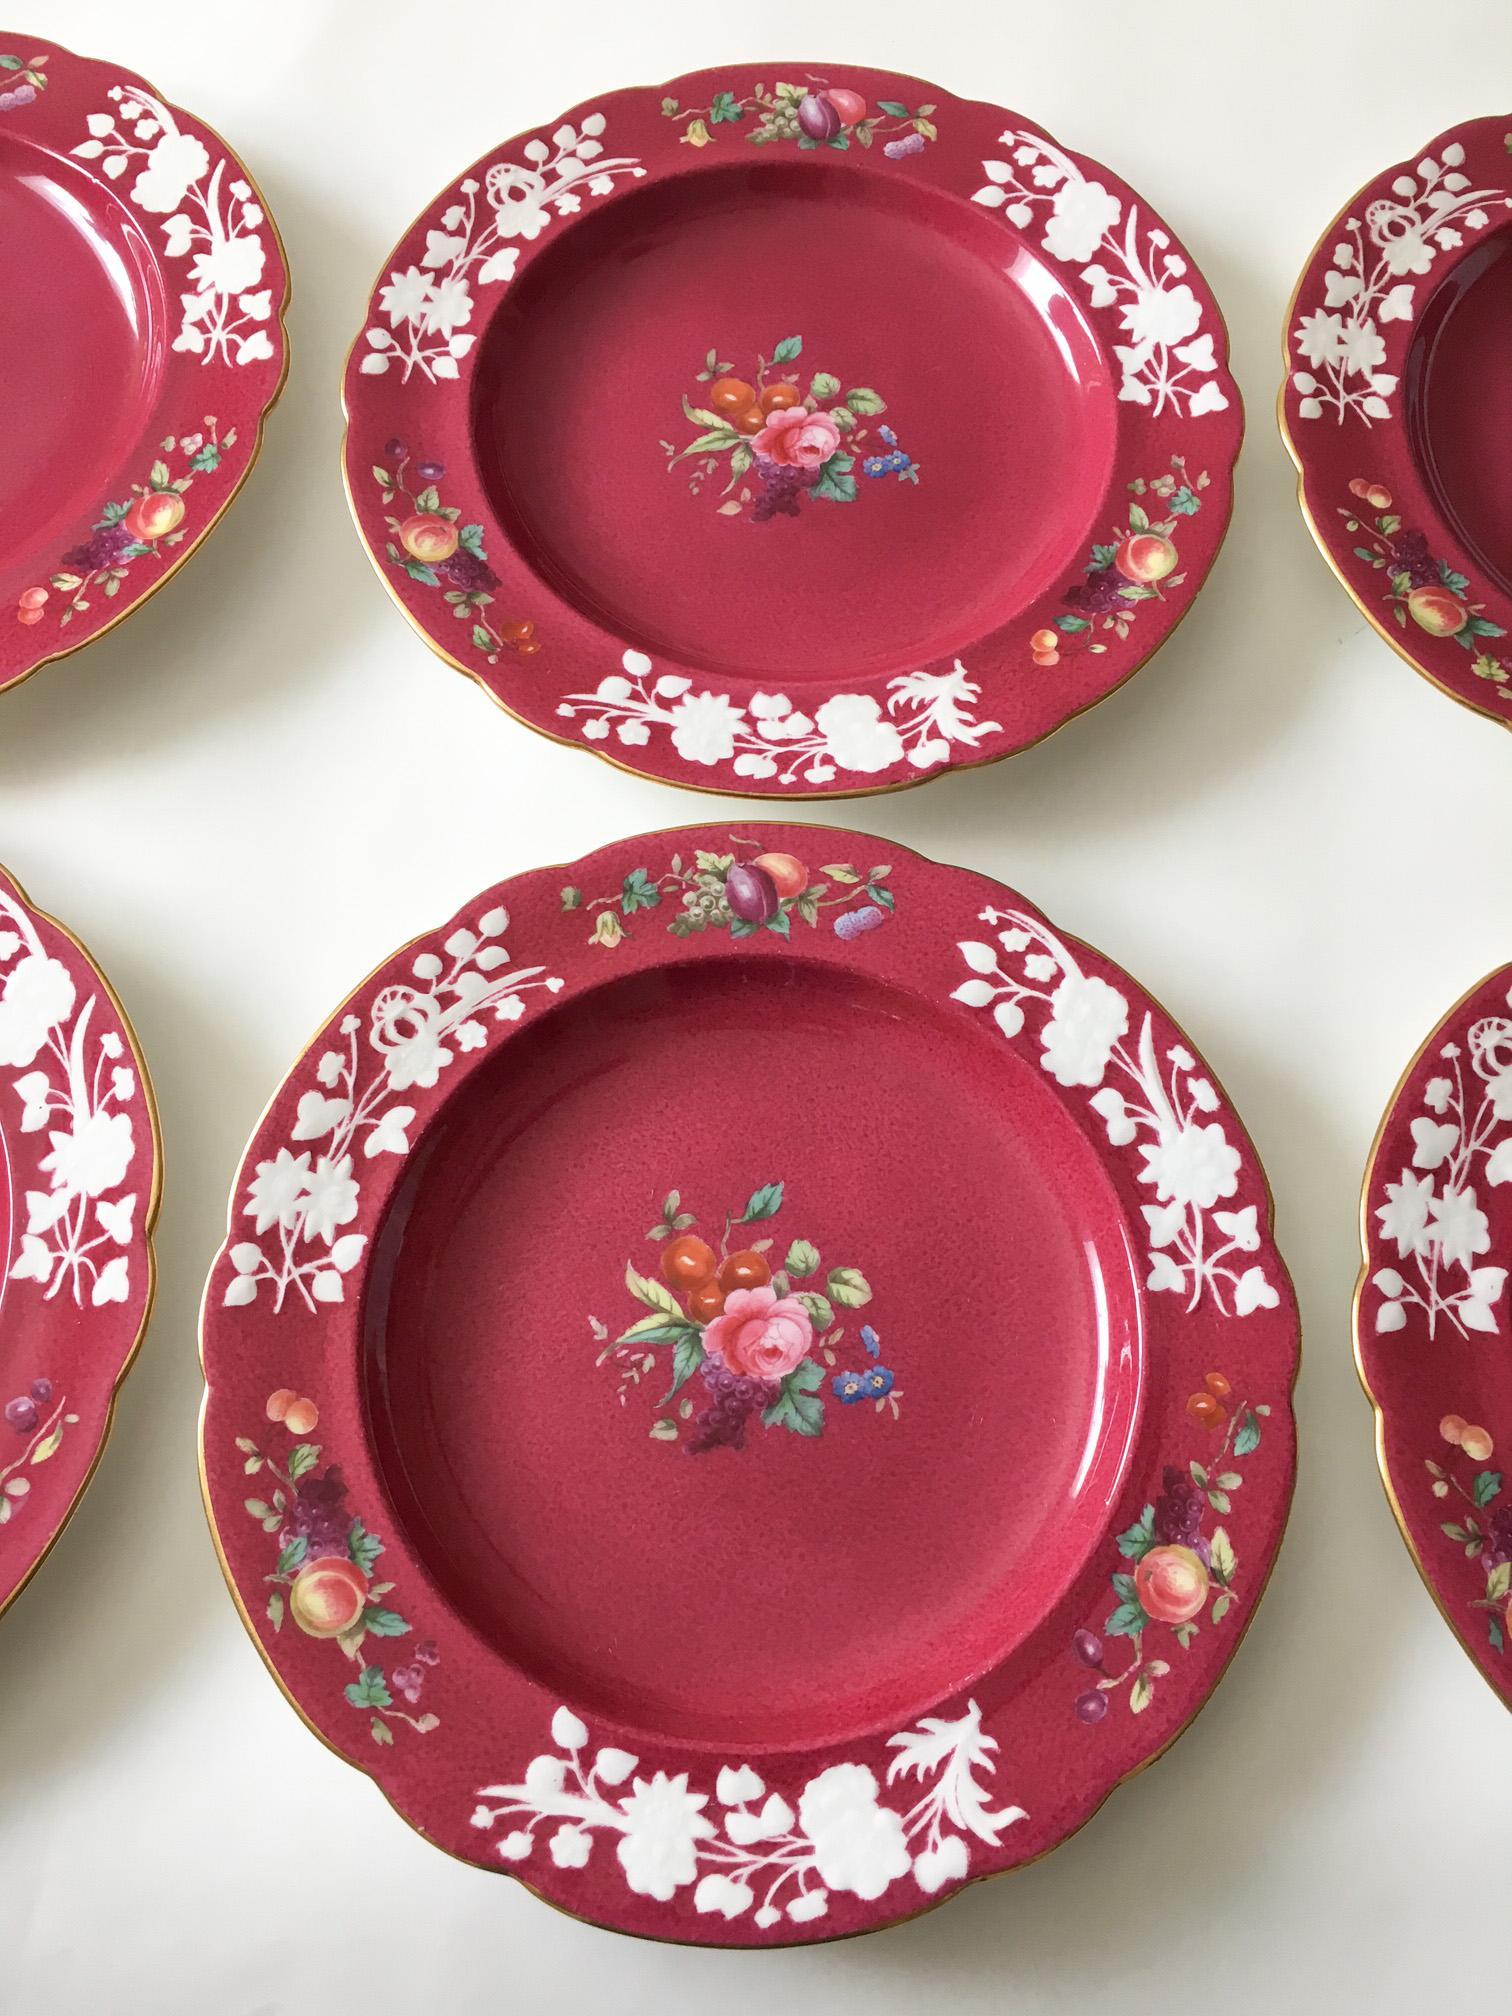 19th Century Copeland Spode for Tiffany u0026 Co. Dessert Plates - Set of 6 -  sc 1 st  Chairish & 19th Century Copeland Spode for Tiffany u0026 Co. Dessert Plates - Set ...